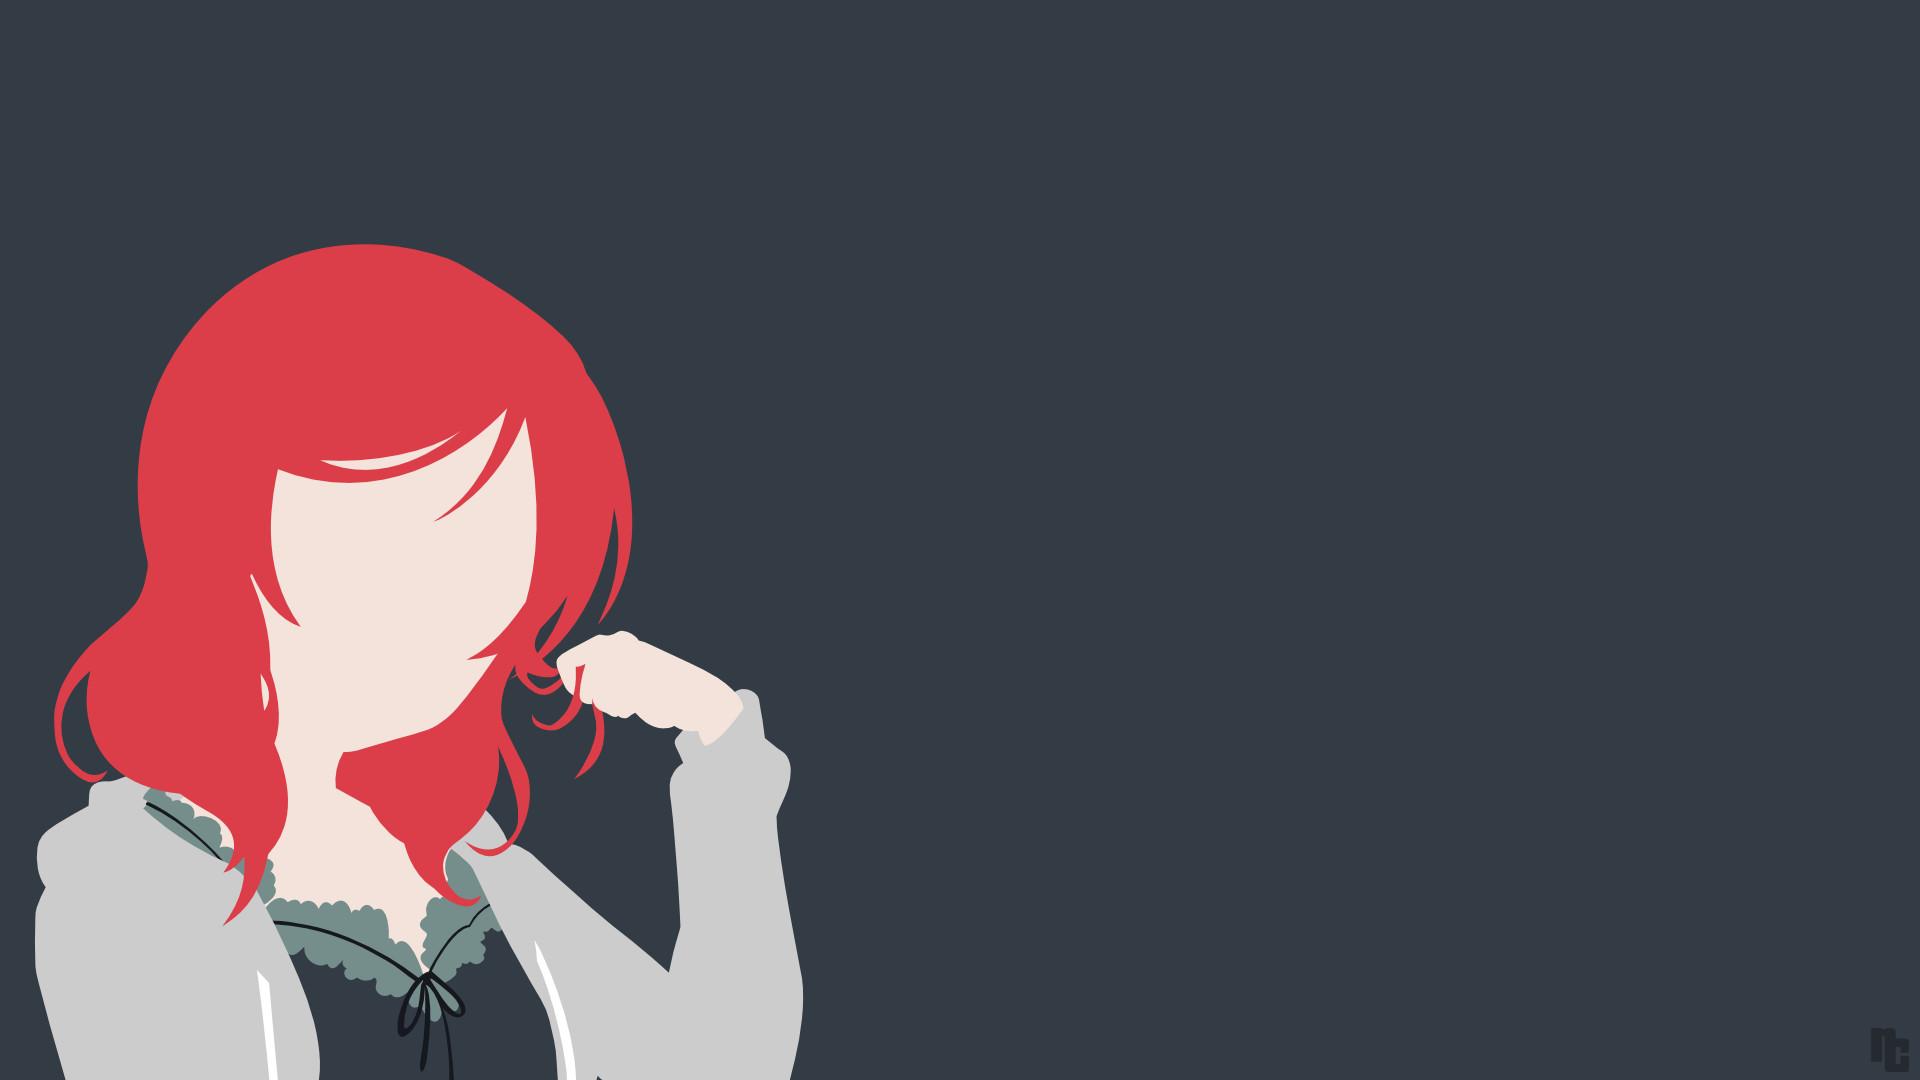 DeviantArt: More Like Hanayo Koizumi (Love Live!) Minimalist Wallpaper by